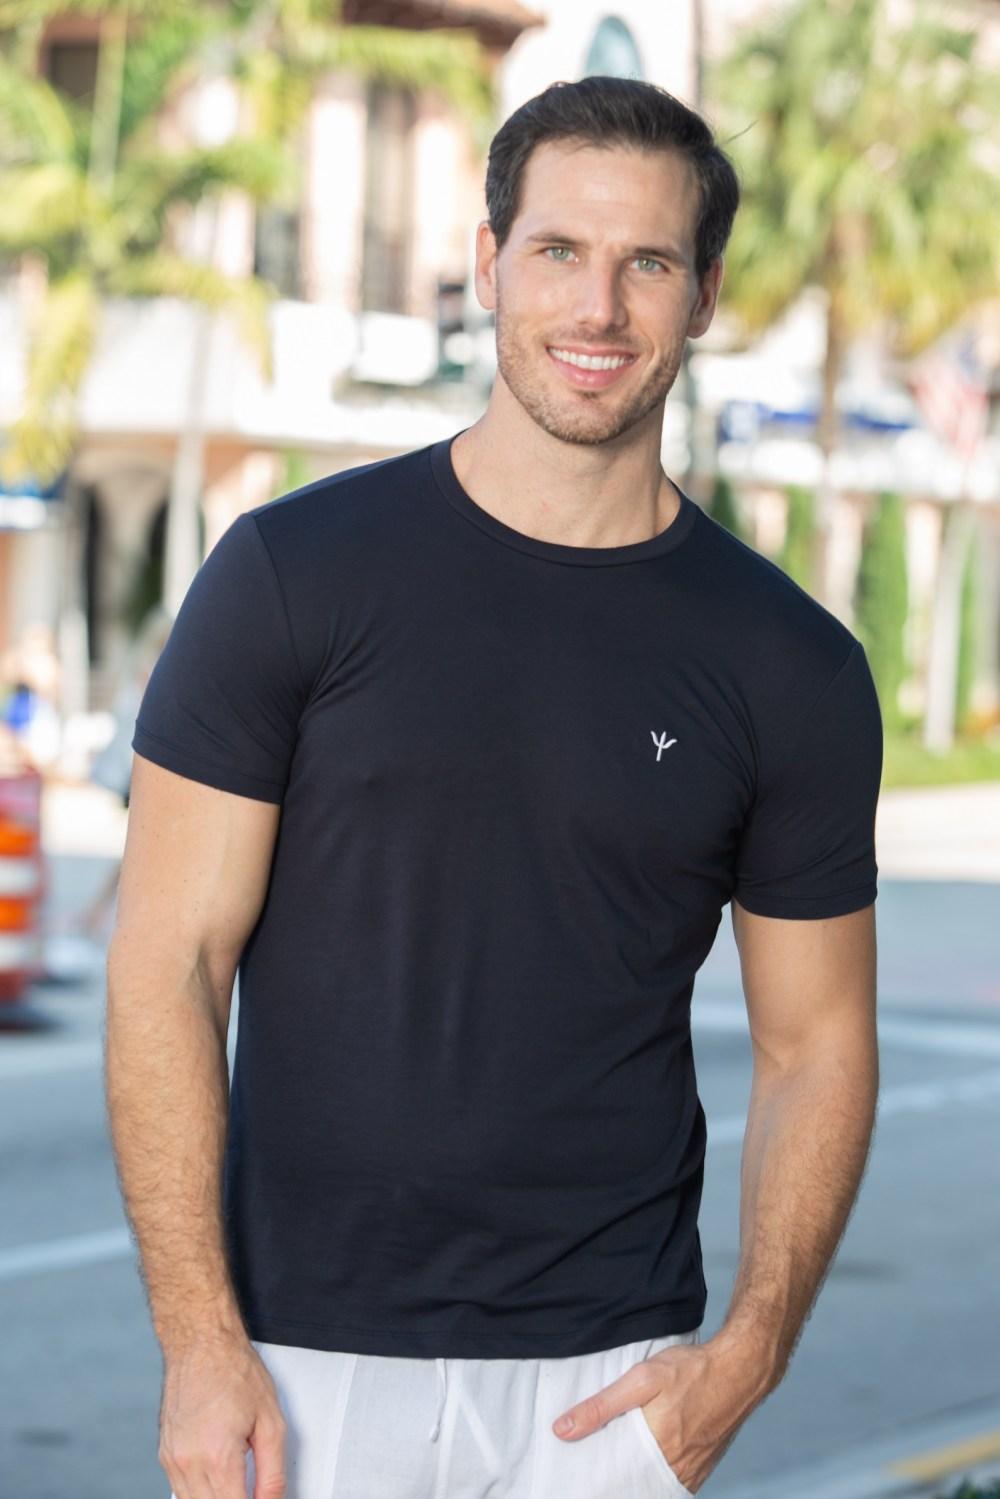 Sky T-Shirt Onyx Black